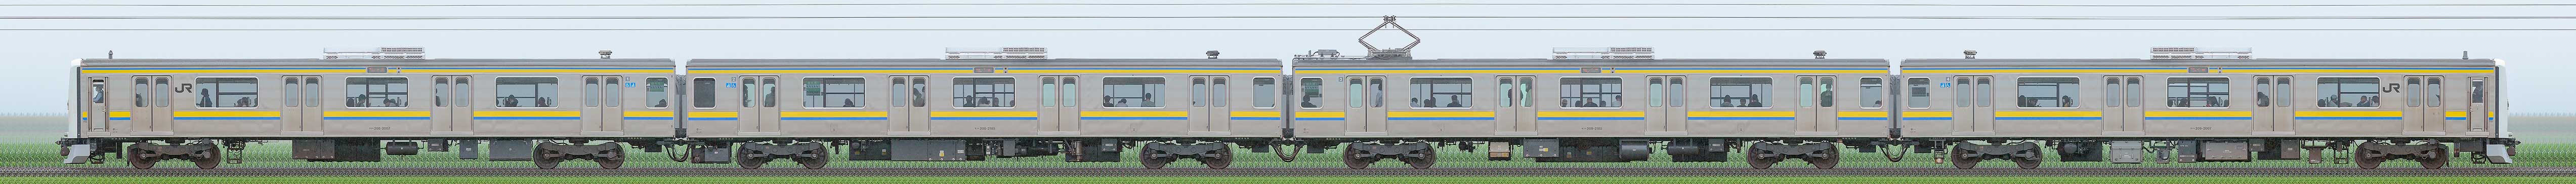 JR東日本 幕張車両センター 209系2000番台C433編成(線路設備モニタリング装置搭載編成・海側)の編成サイドビュー